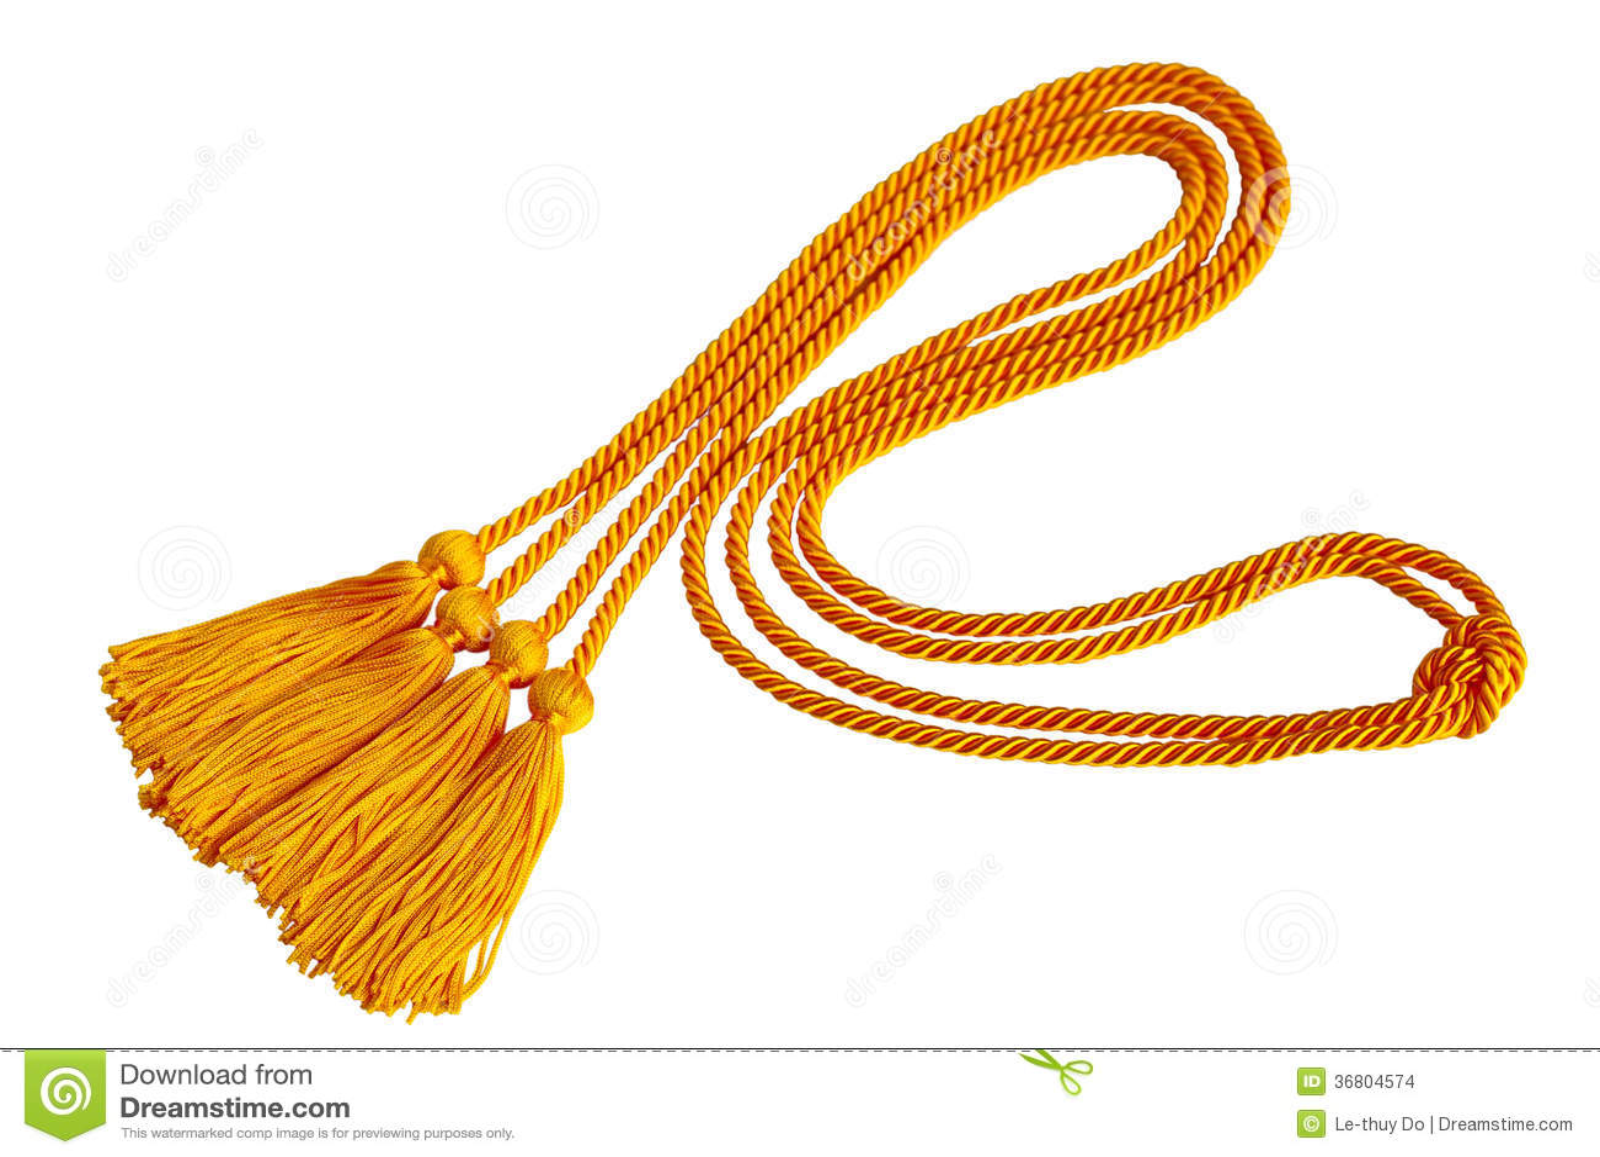 Gradution cord